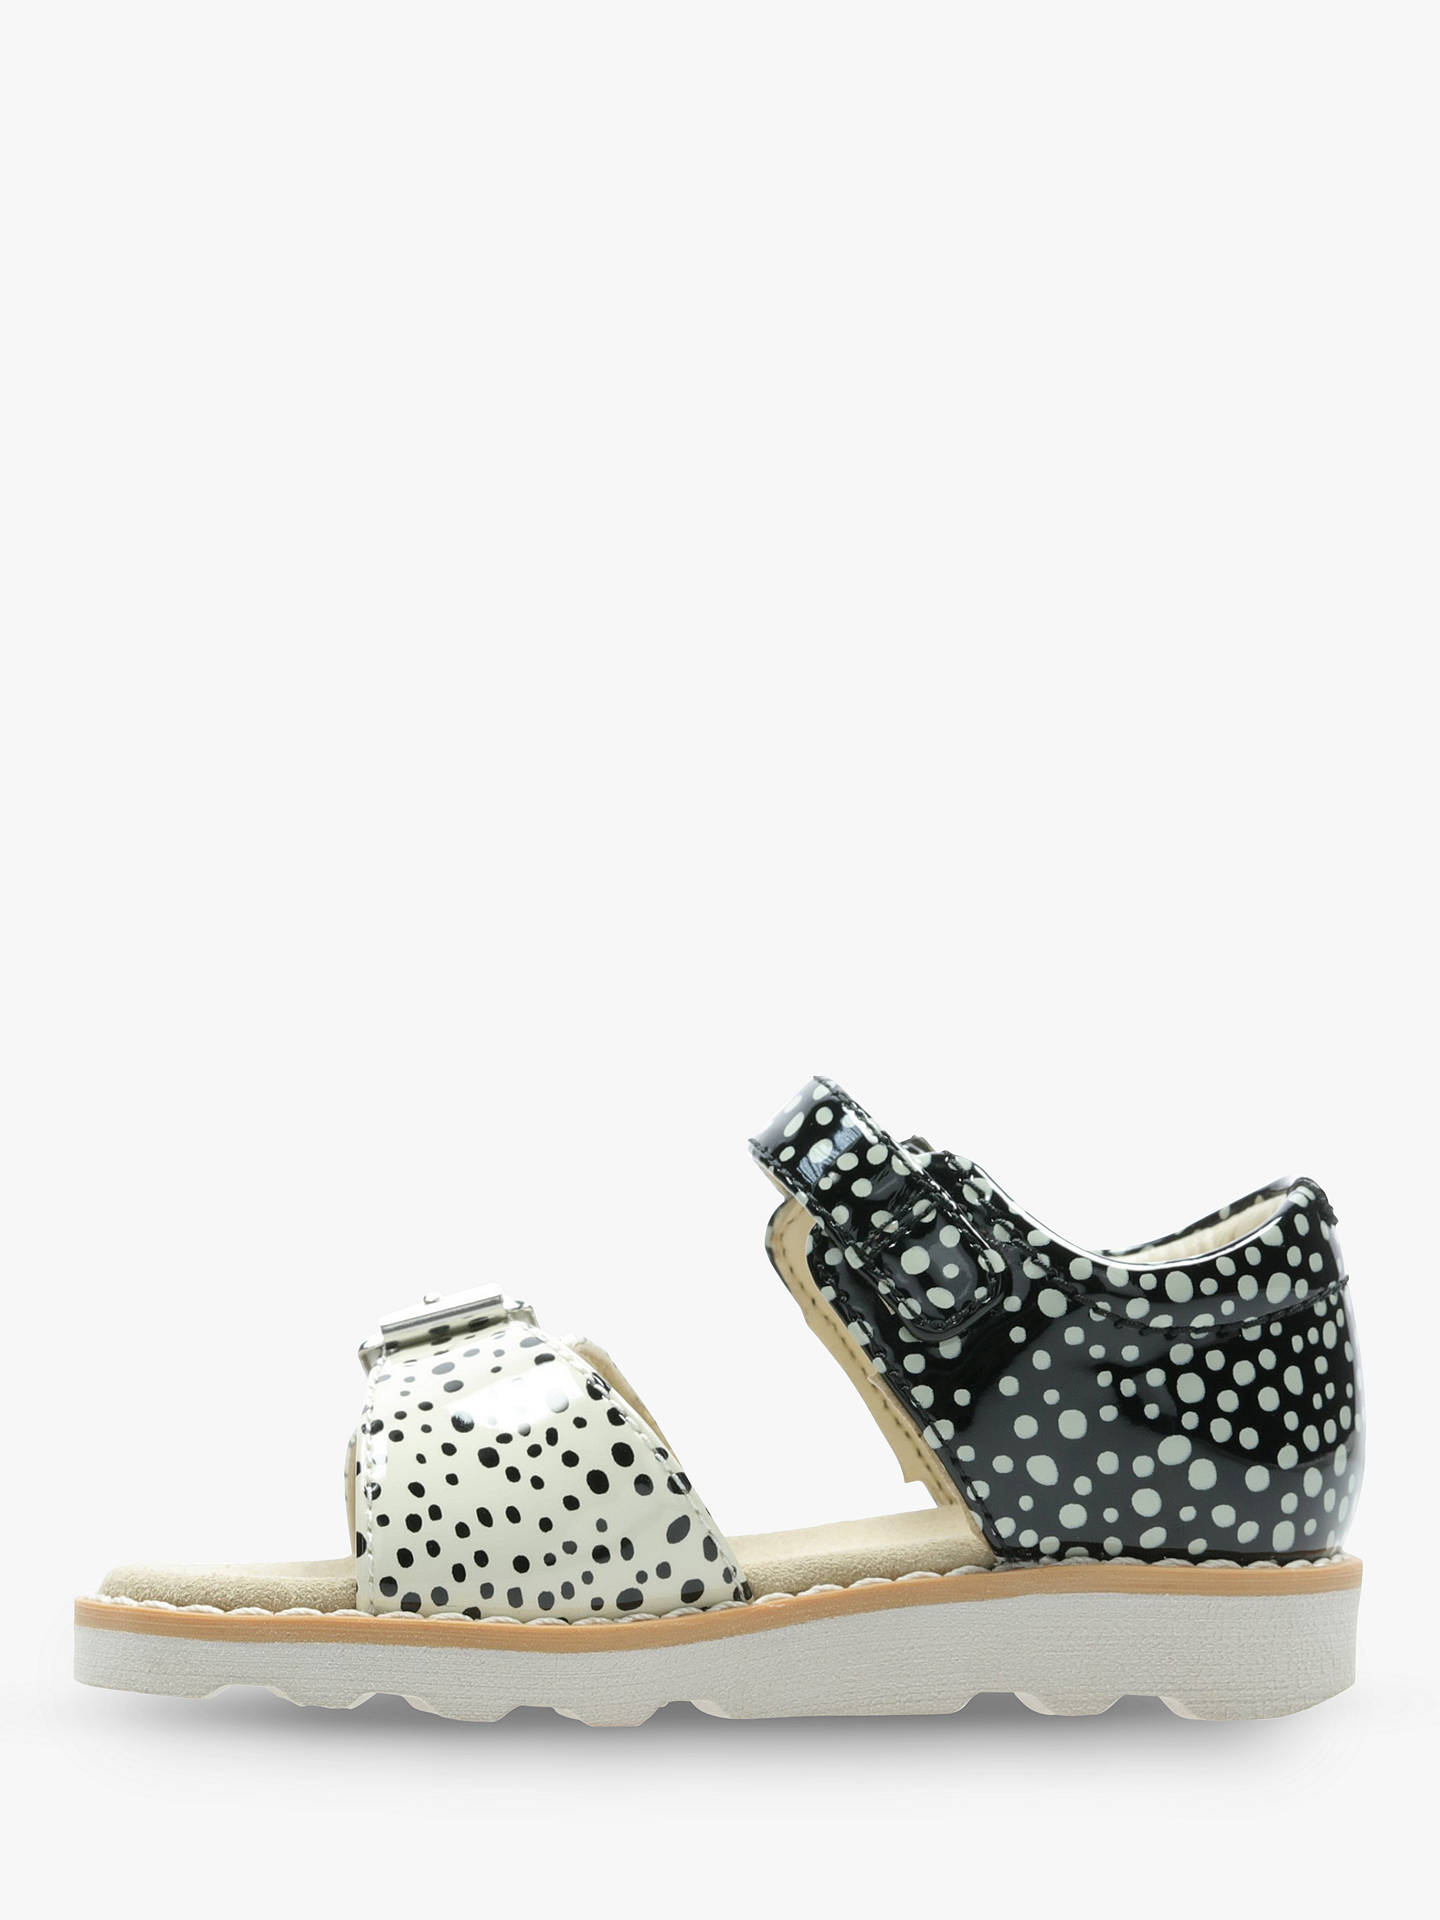 9ab977c32be8 ... Buy Clarks Children s Crown Bloom Spot Print Sandals